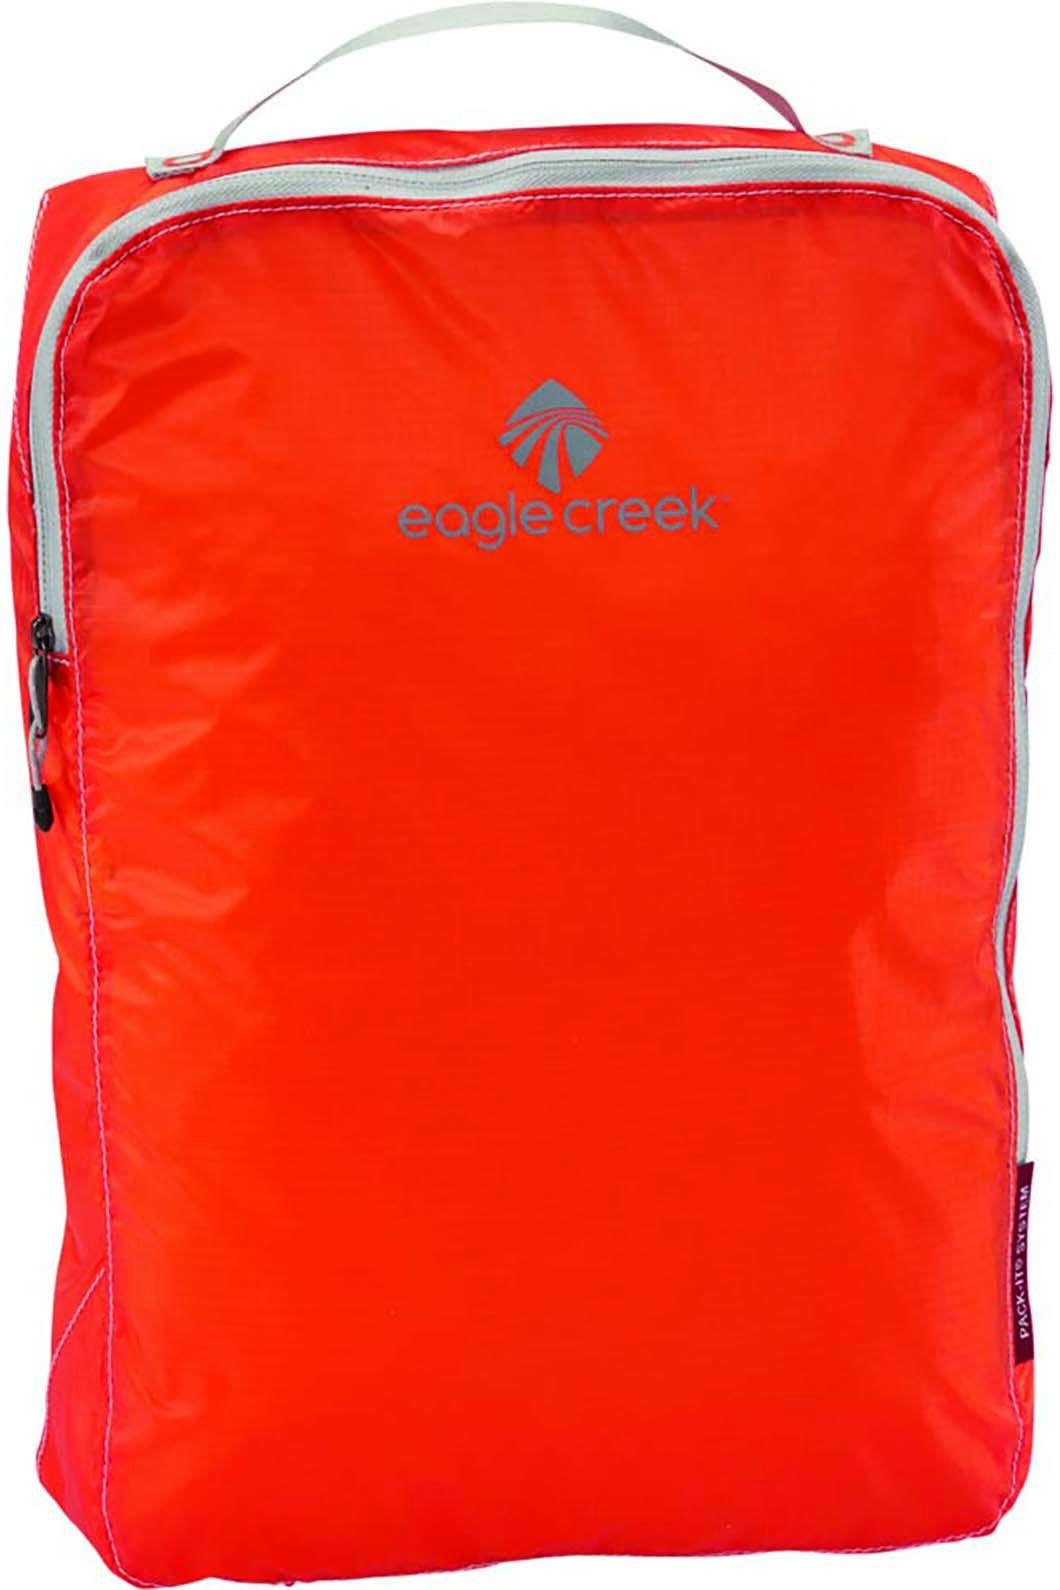 Eagle Creek Pack-It Specter Cubetrobe, Flame Orange, hi-res